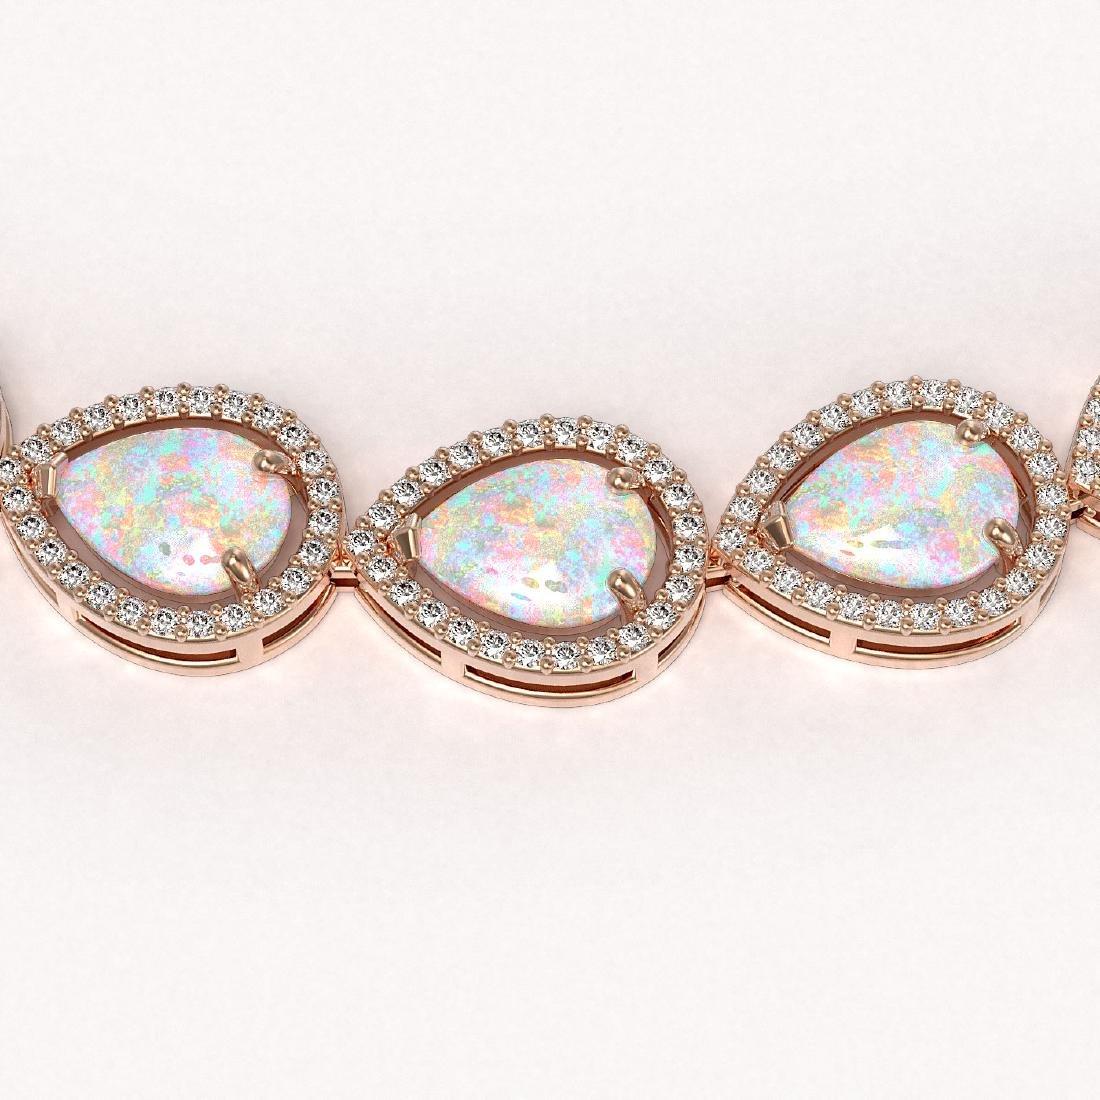 36.48 CTW Opal & Diamond Halo Necklace 10K Rose Gold - 3